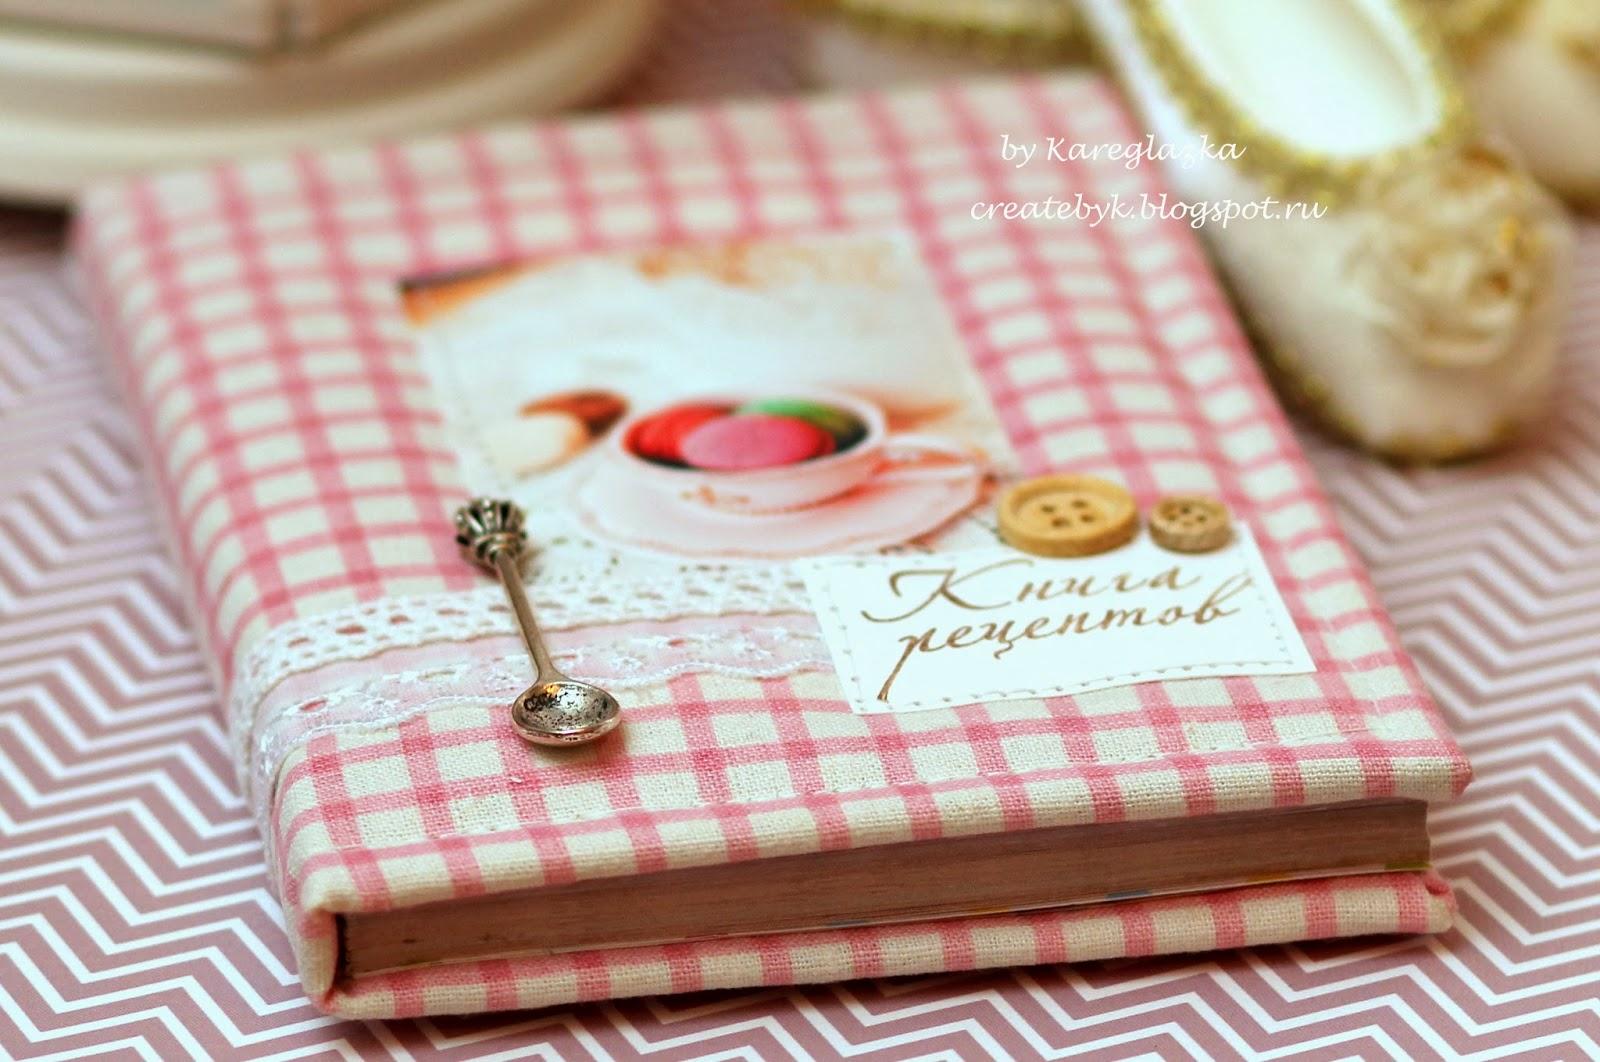 кулинарная книга ручная работа